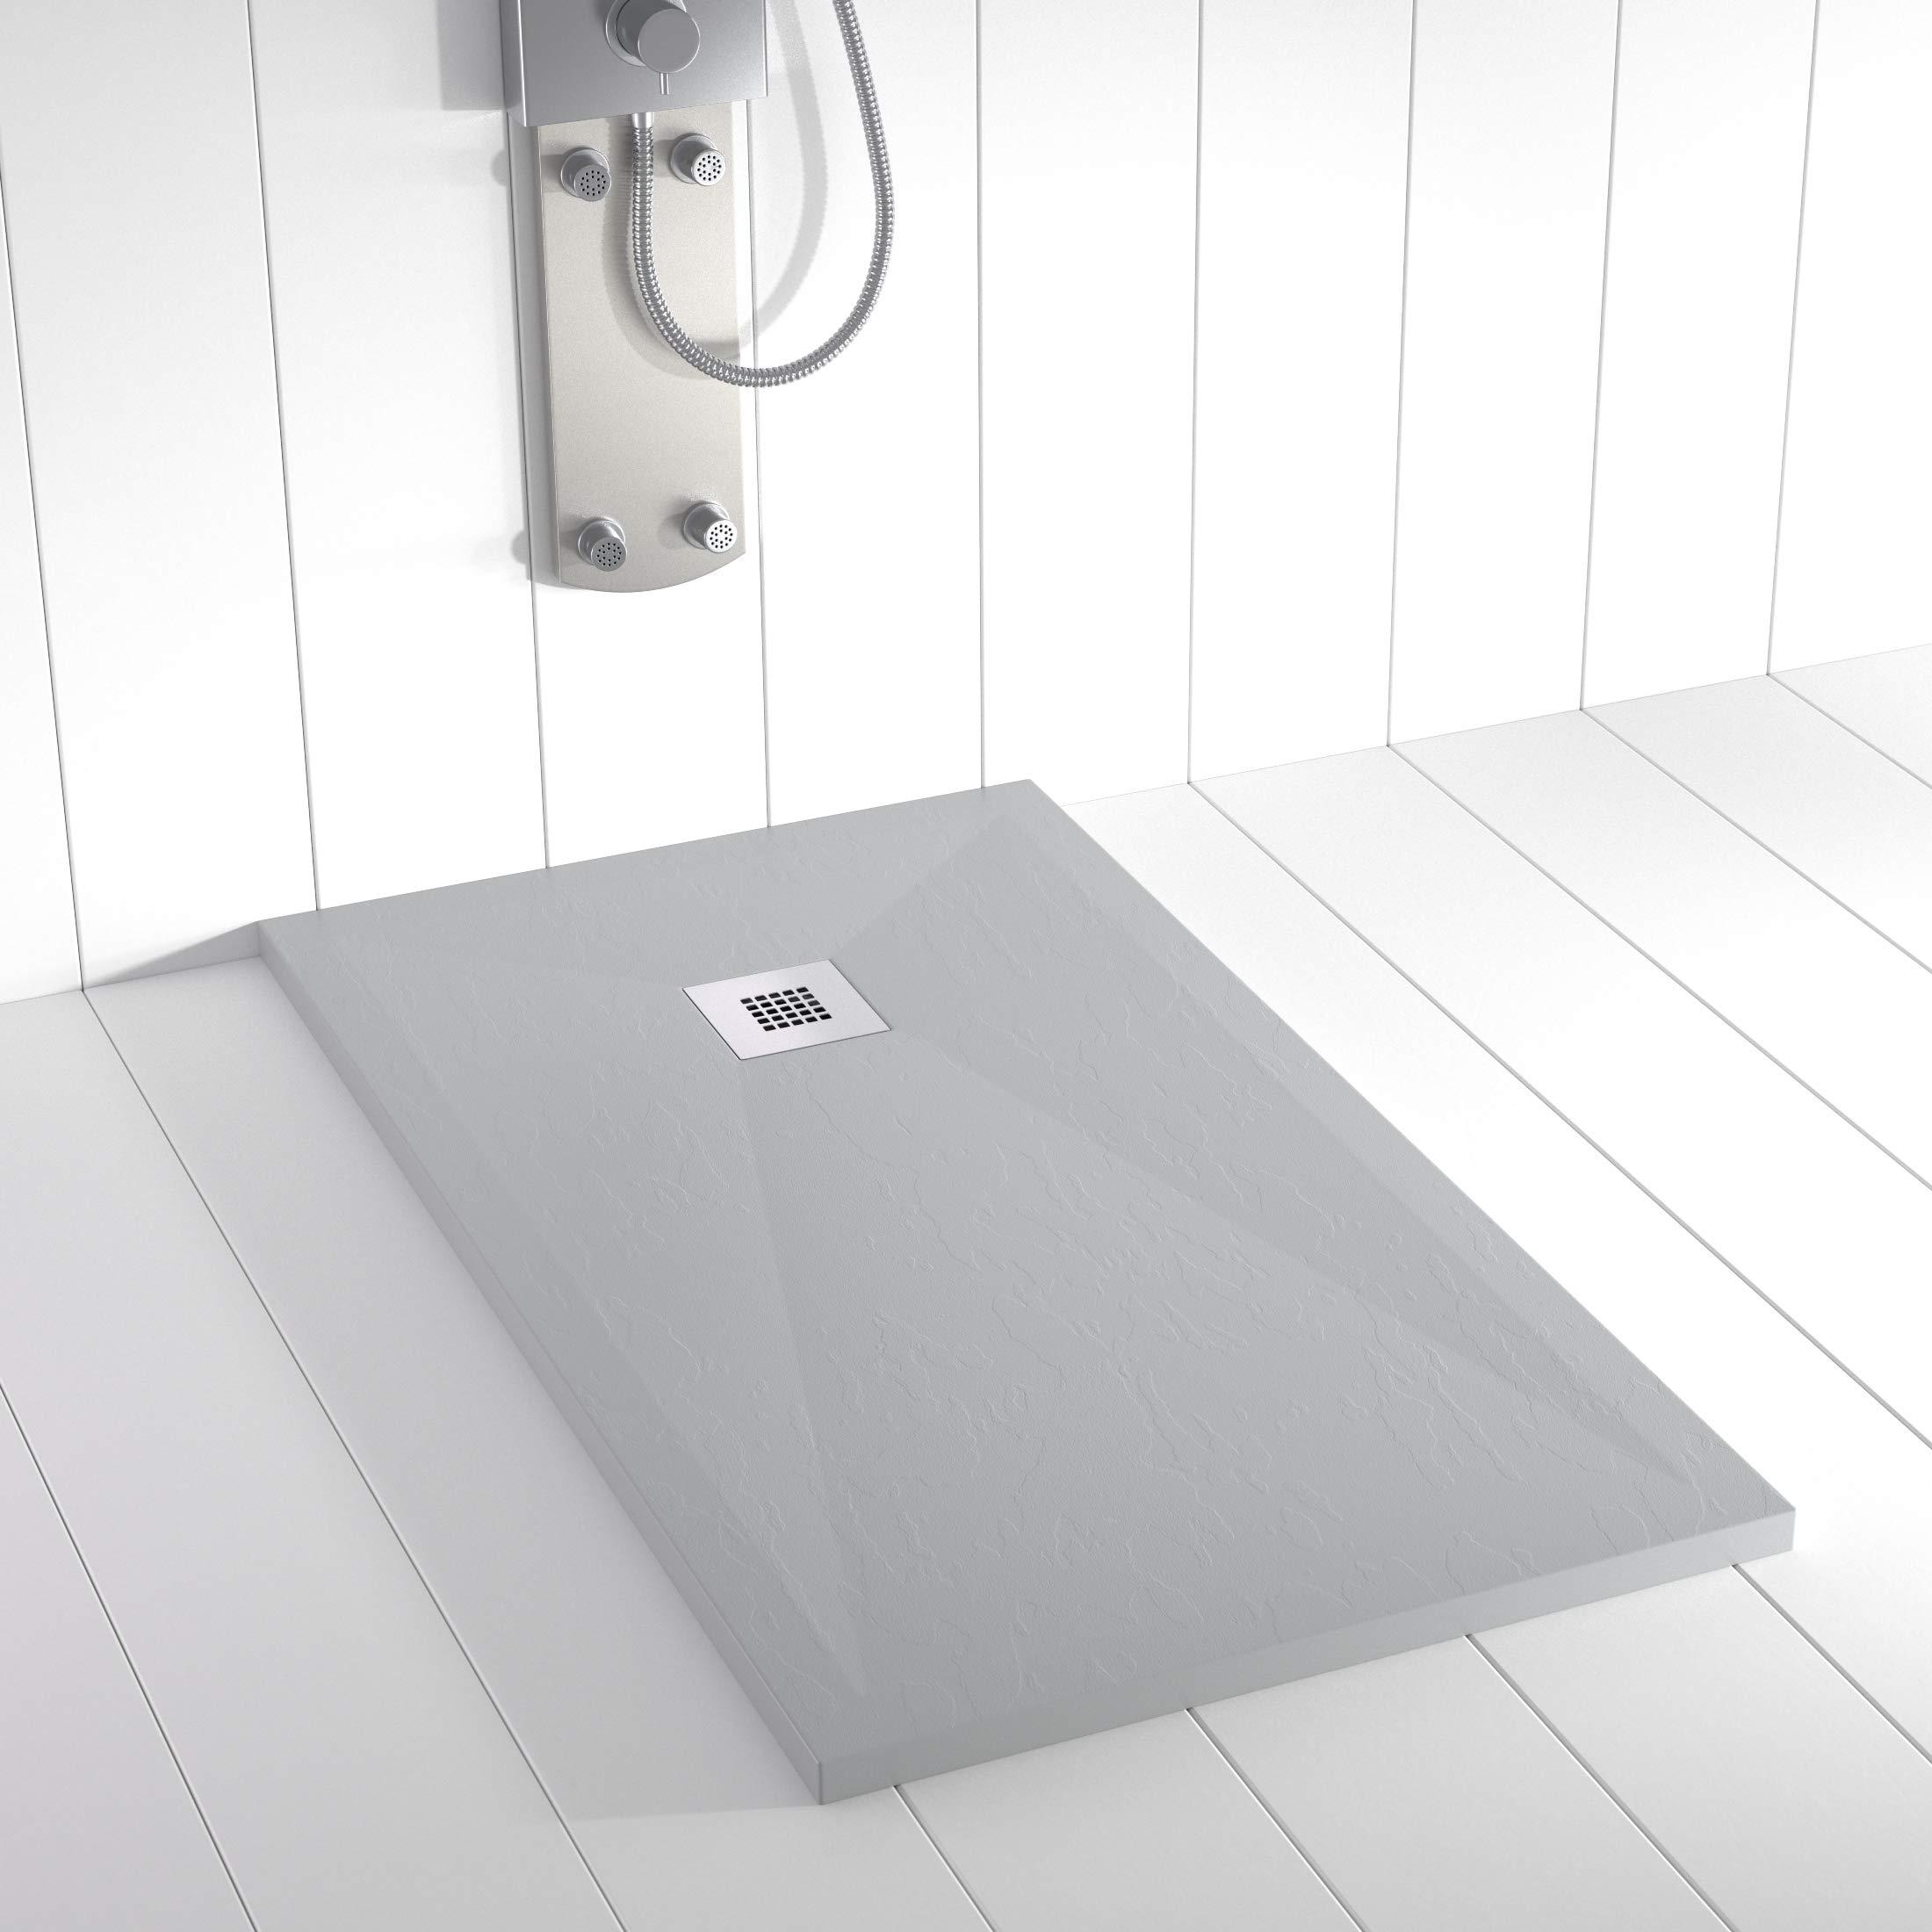 Plato de Ducha Resina PLES Gris Cemento - 200x80 cm: Amazon.es: Hogar